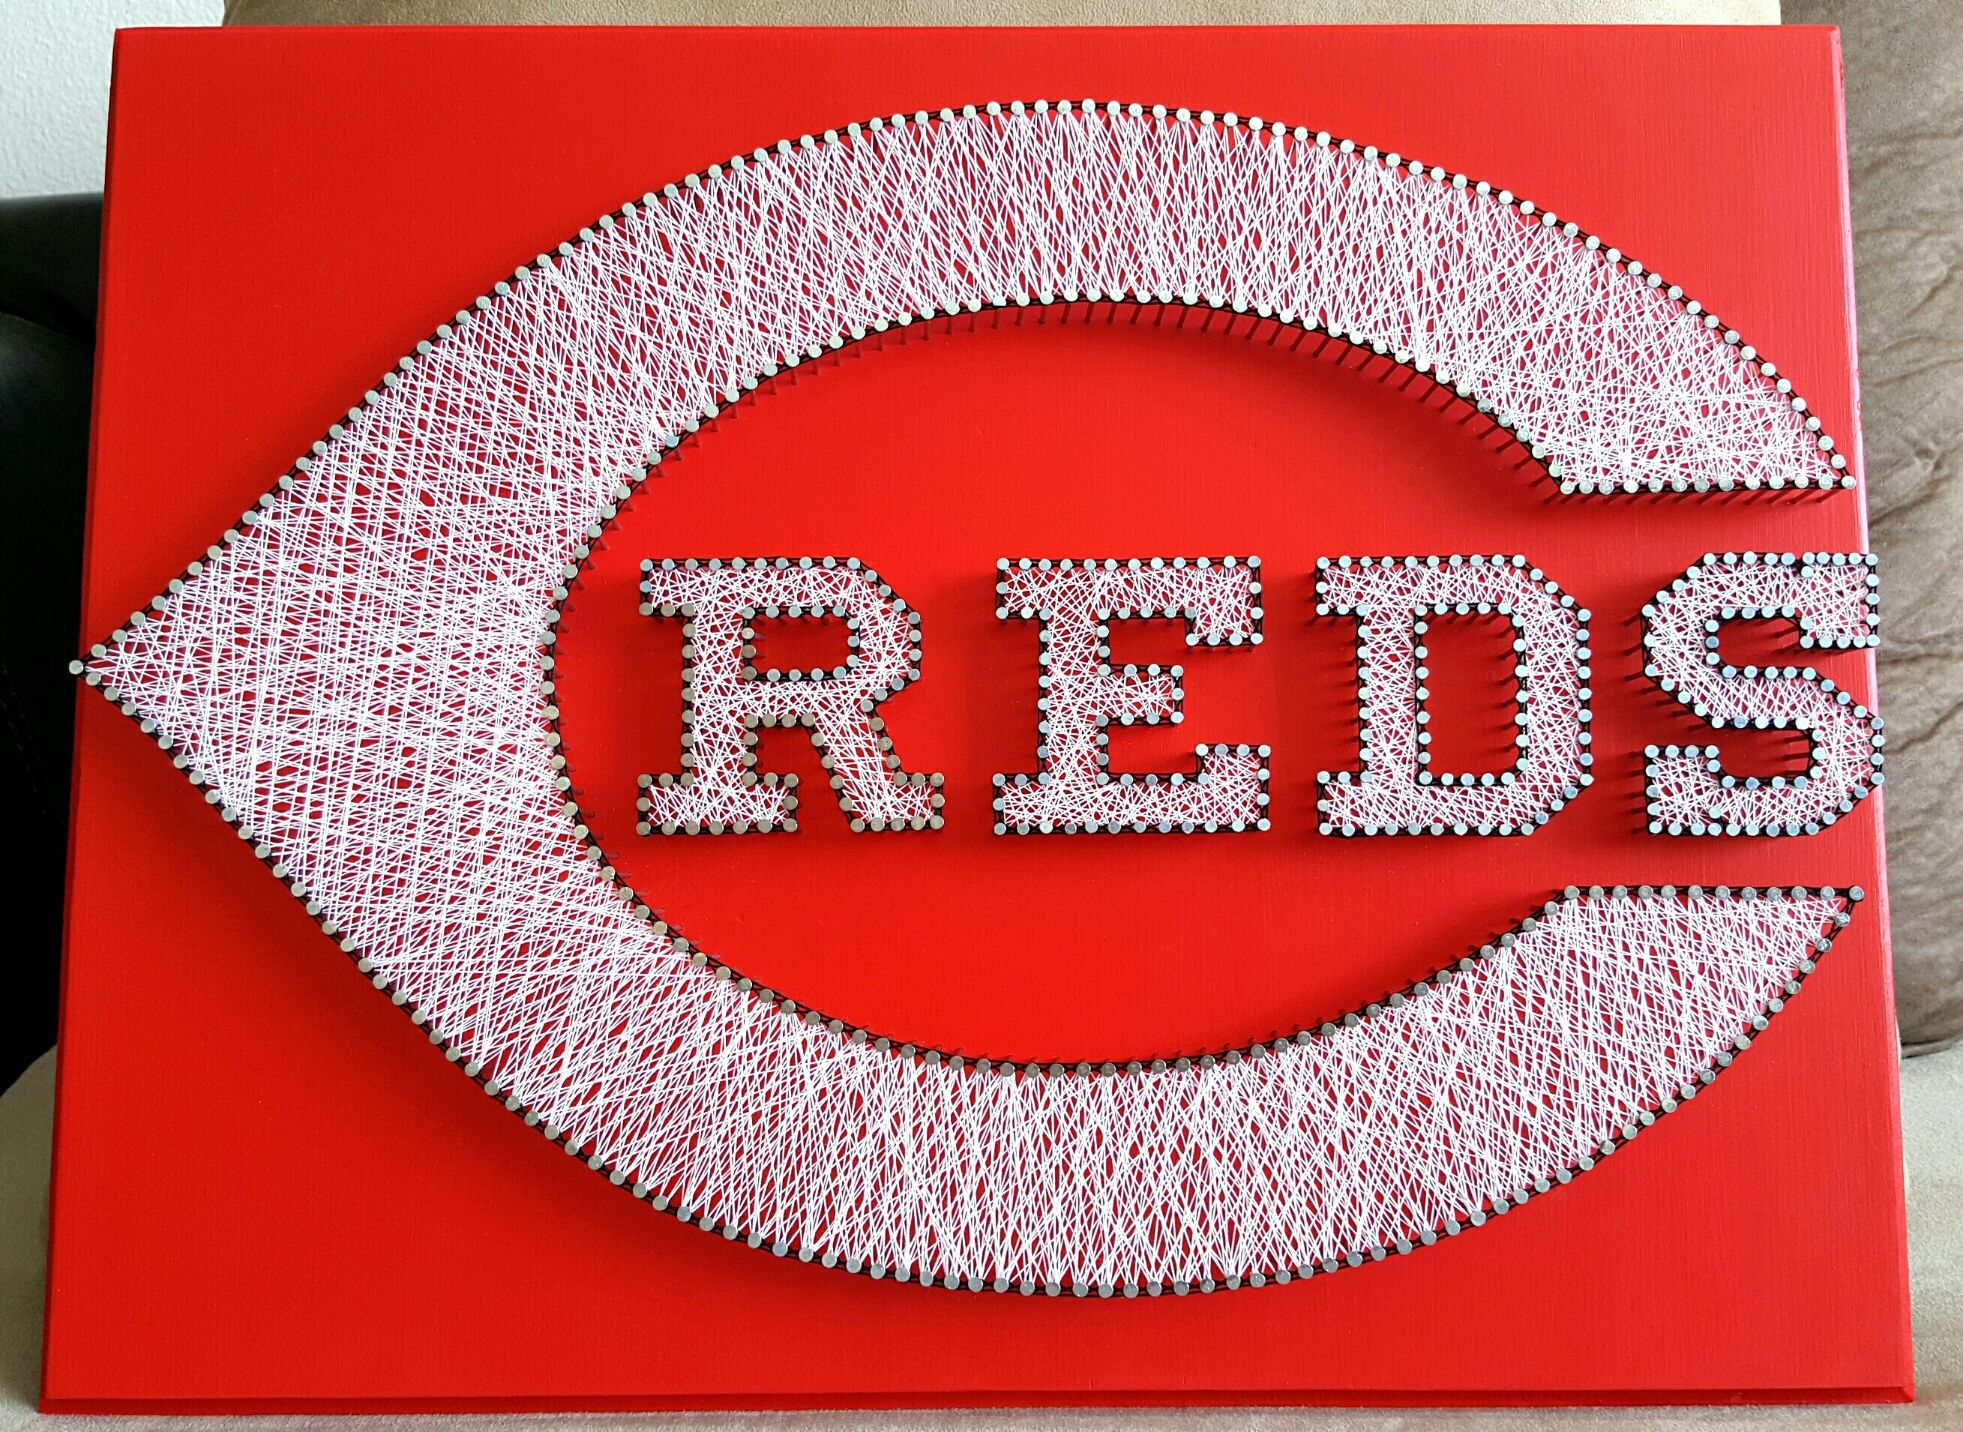 16 x 20 Cincinnati Reds string art